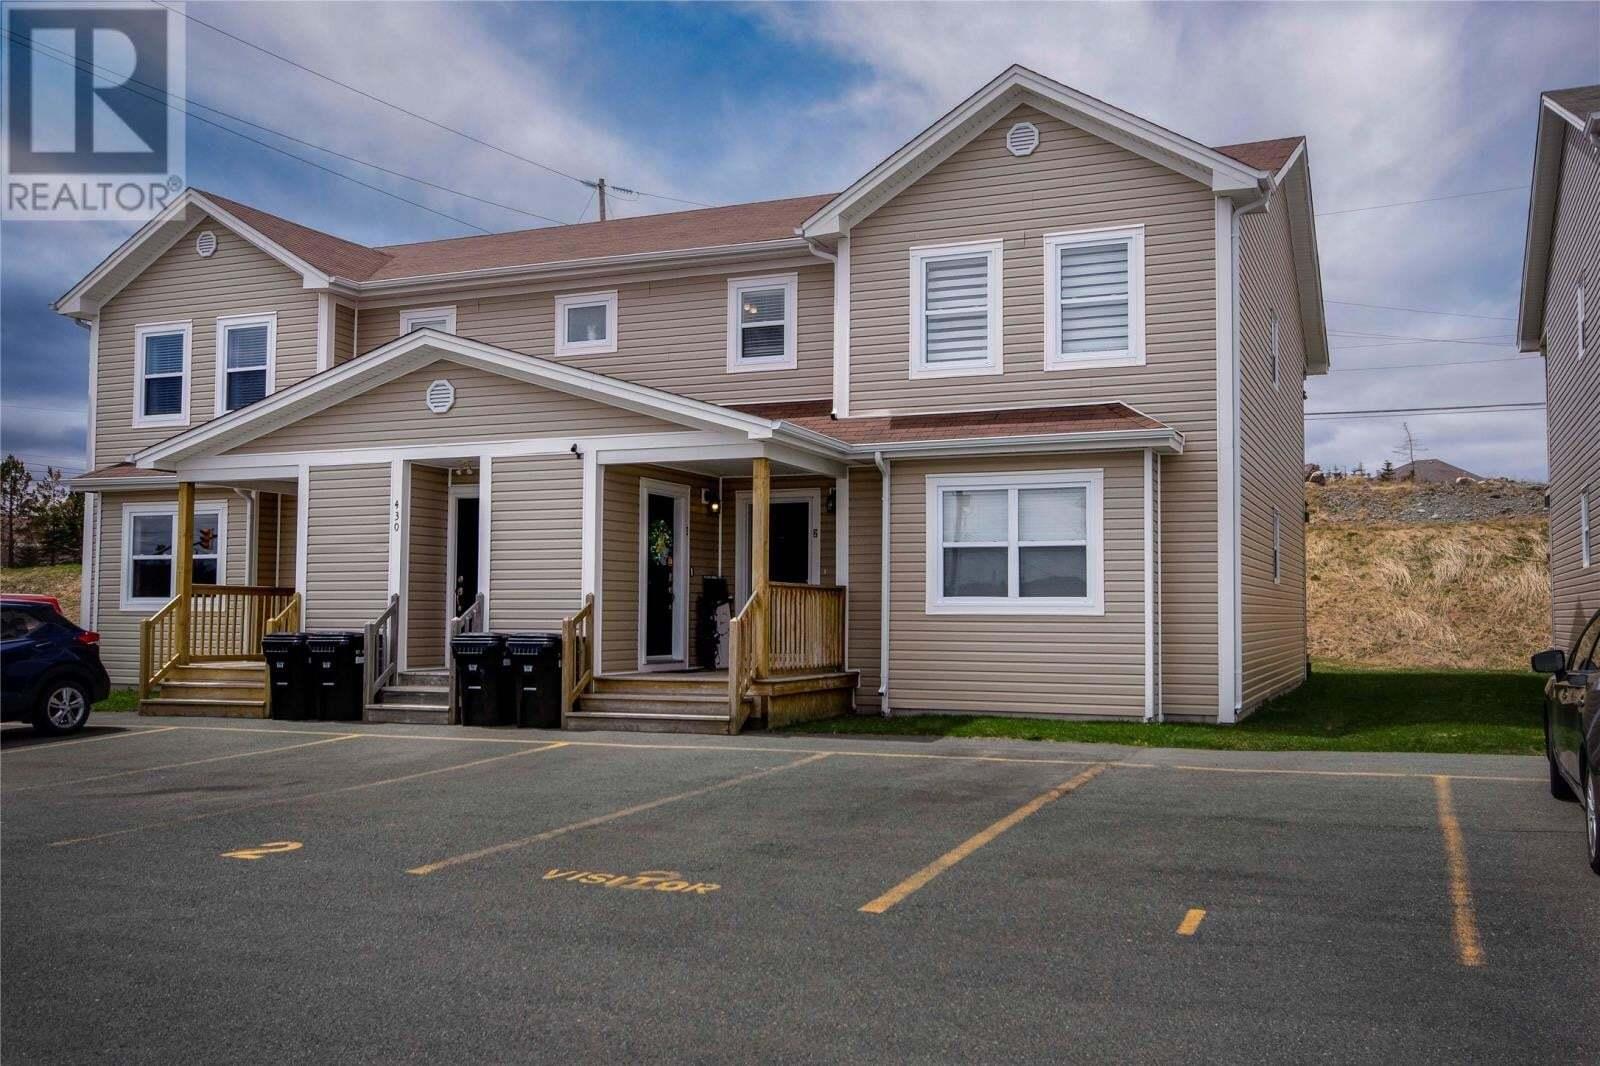 House for sale at 430 Blackmarsh Rd St. John's Newfoundland - MLS: 1214124